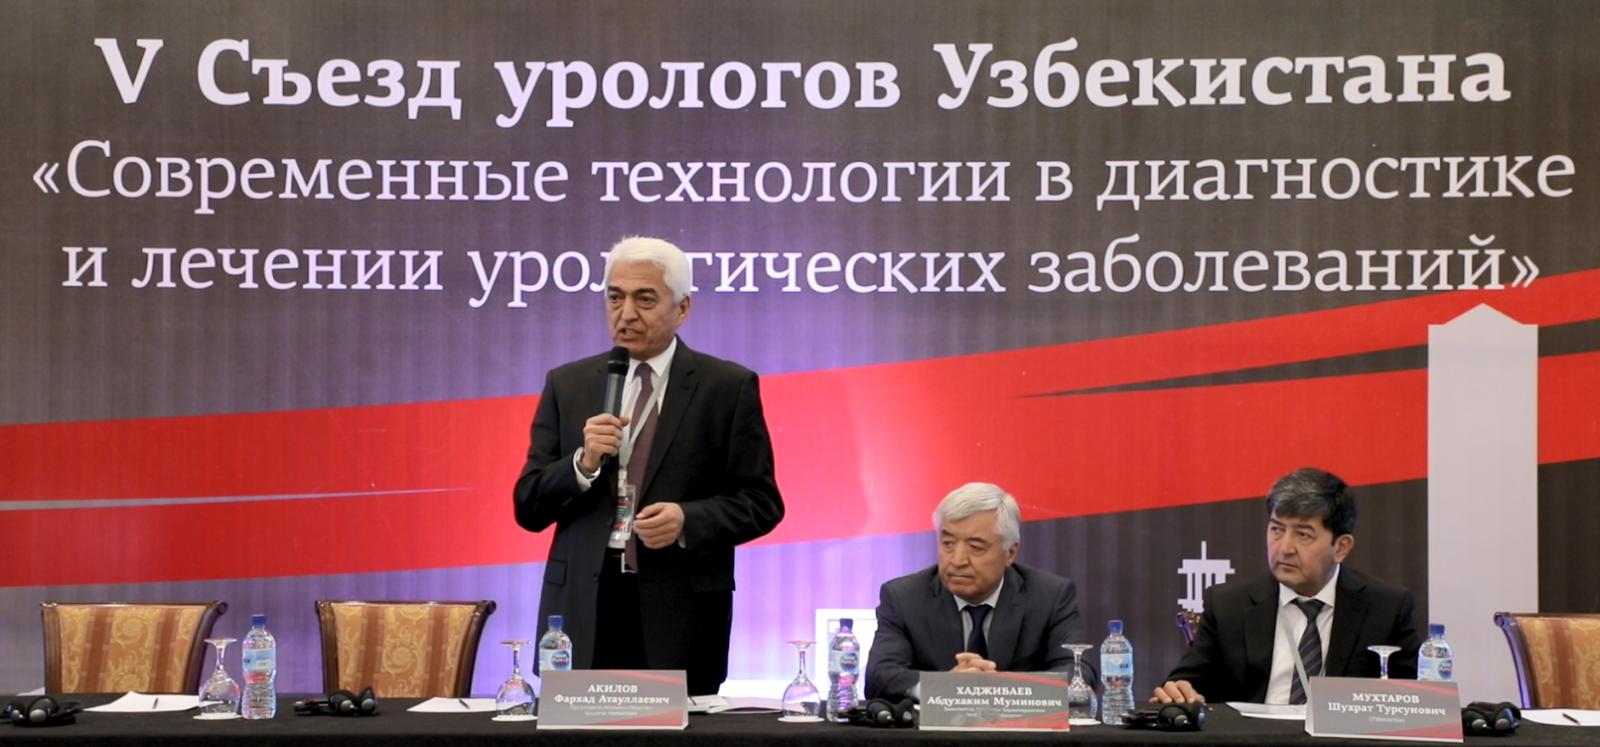 http://medicalexpress.ru/uploads/reportss/Popp/foto.PNG